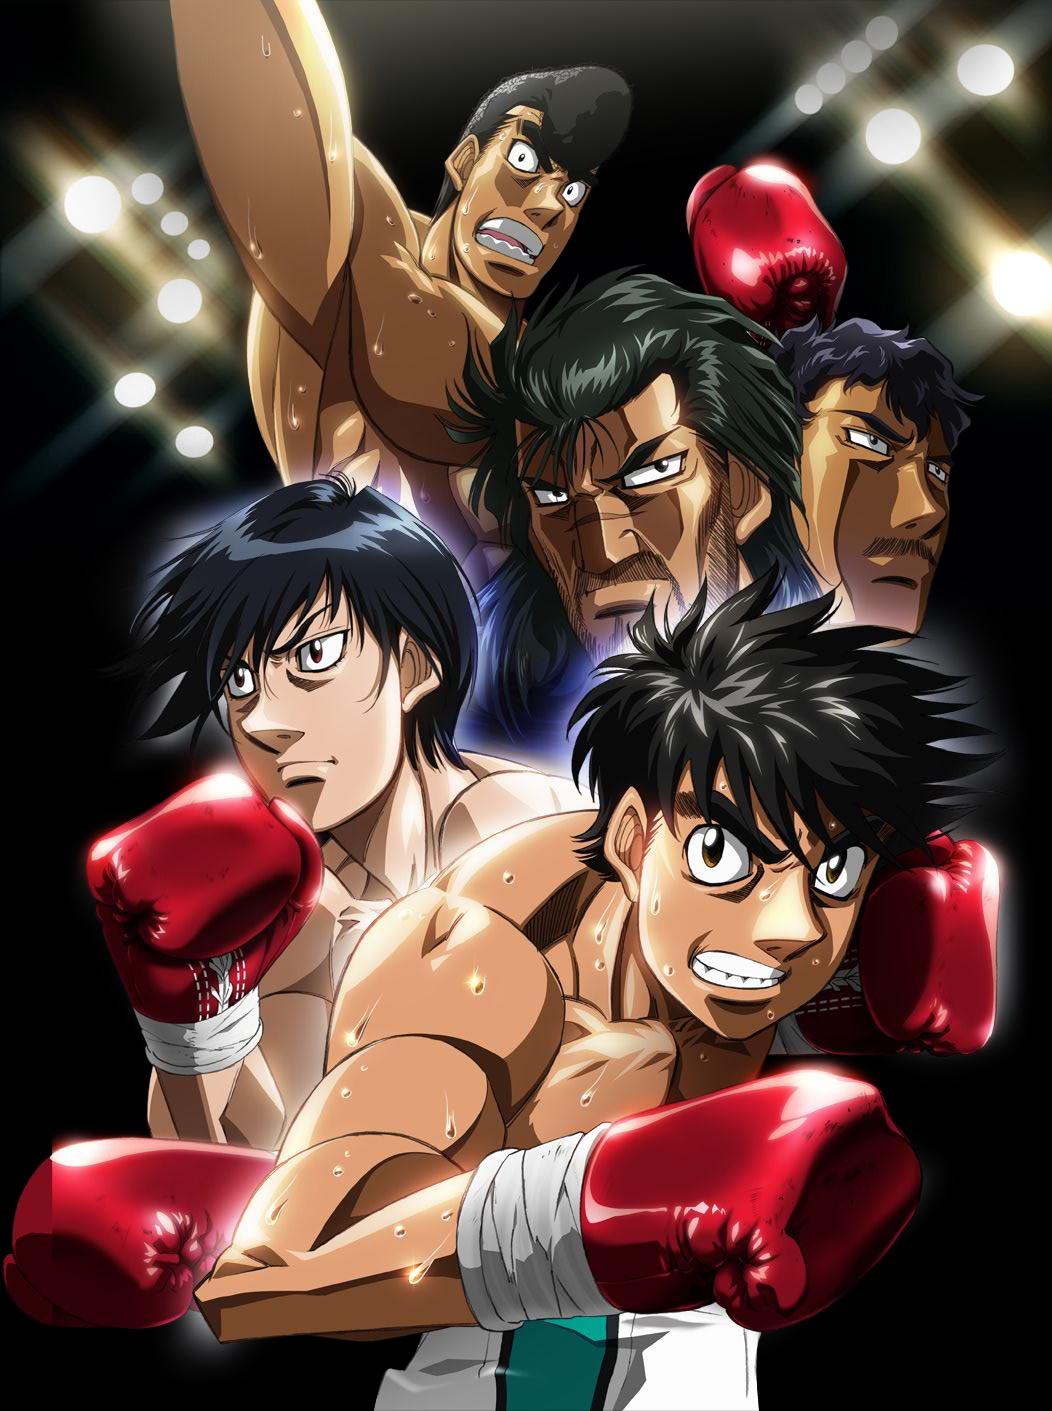 Hajime no Ippo: New Challenger |26/26| |Sub. Español| |Mega|